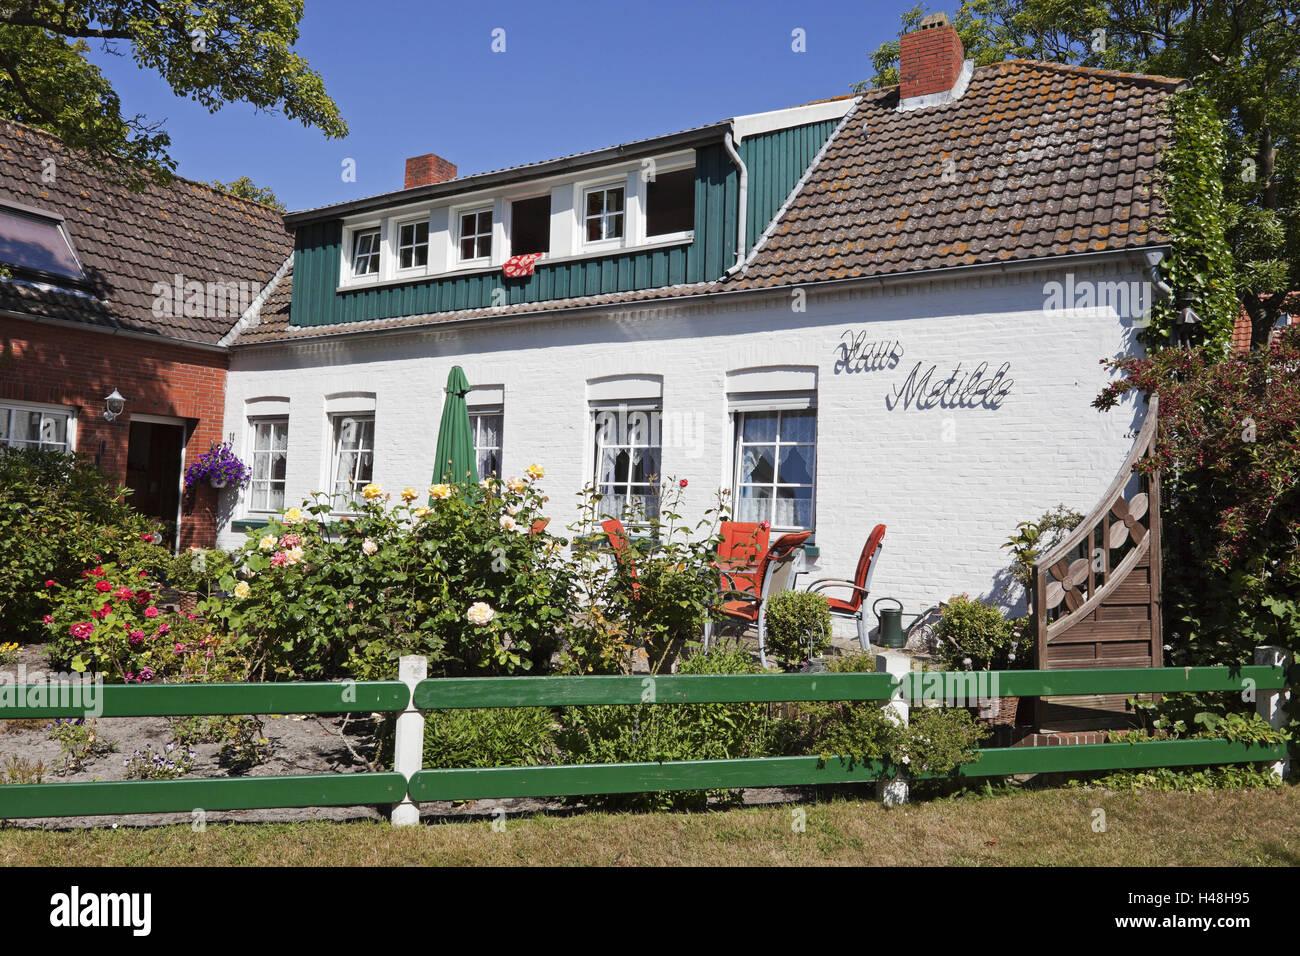 Private Boarding House U0027House Metildeu0027, Island Spiekeroog,   Stock Image